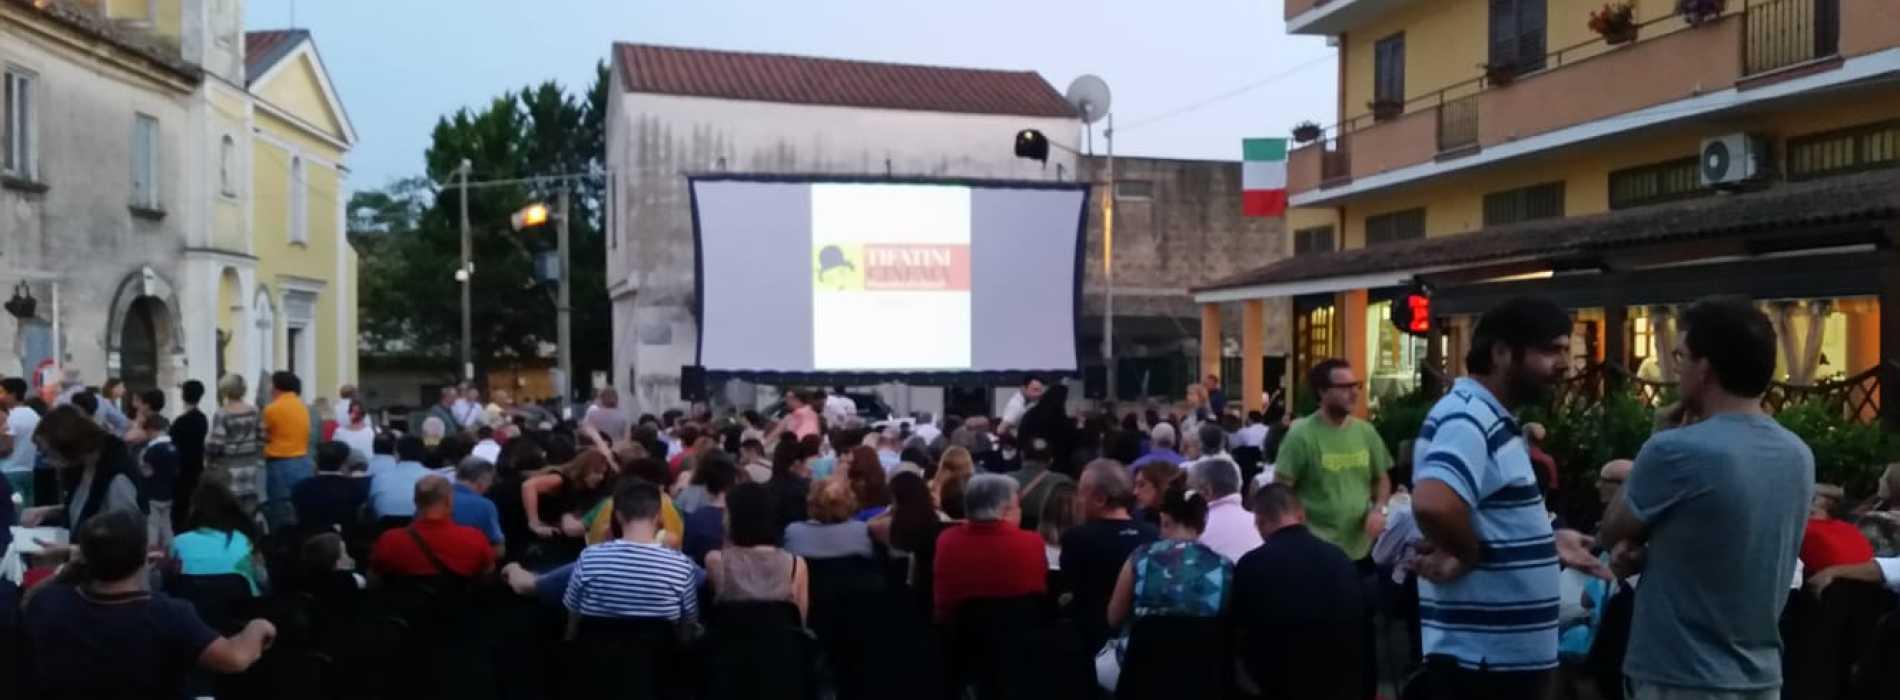 Tifatini Cinema. In estate a Caserta i film si vedono in collina